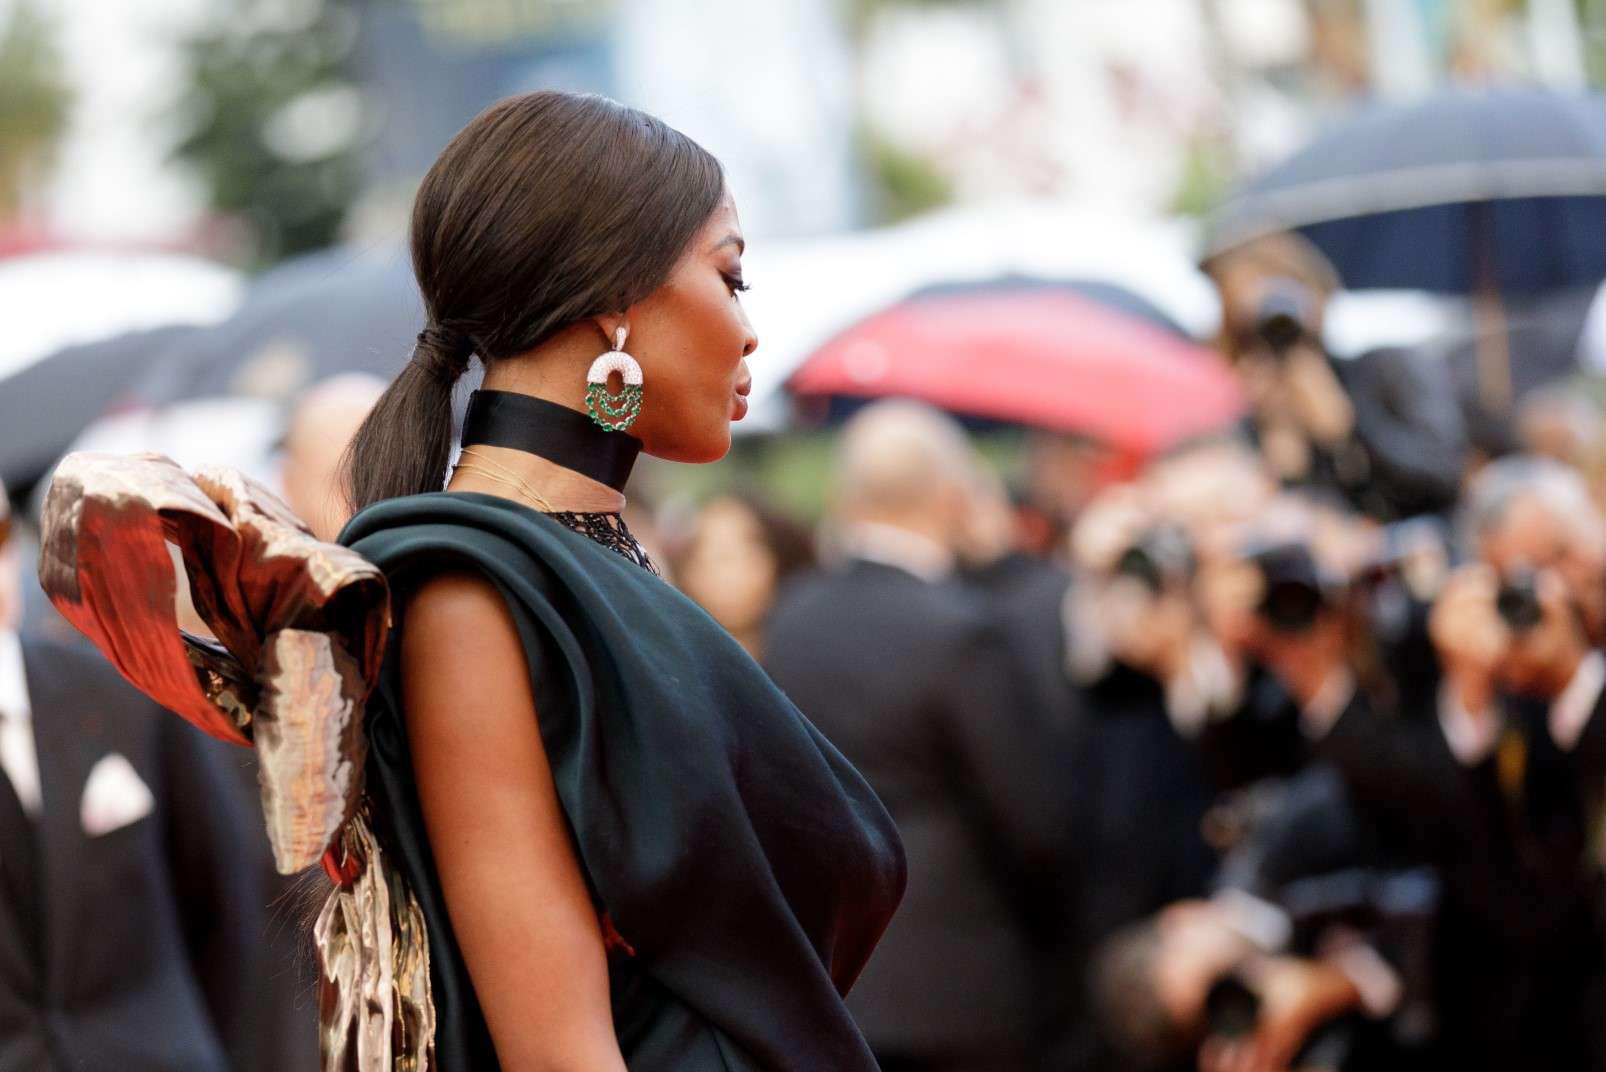 Cannes 2018, Naomi Campbell wearing de Grisogono jewellery, photo courtesy of de Grisogono